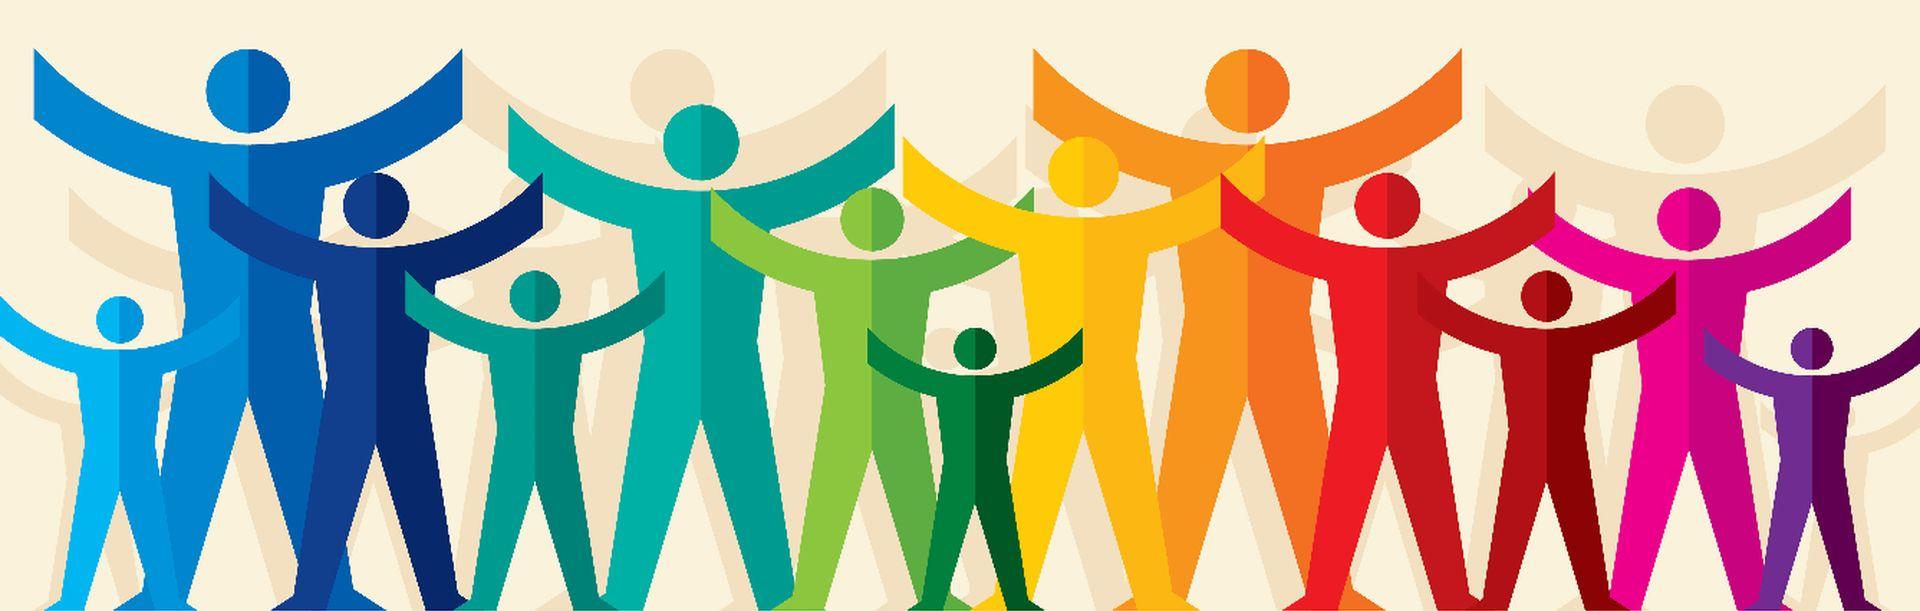 Building Hope Through Partnerships